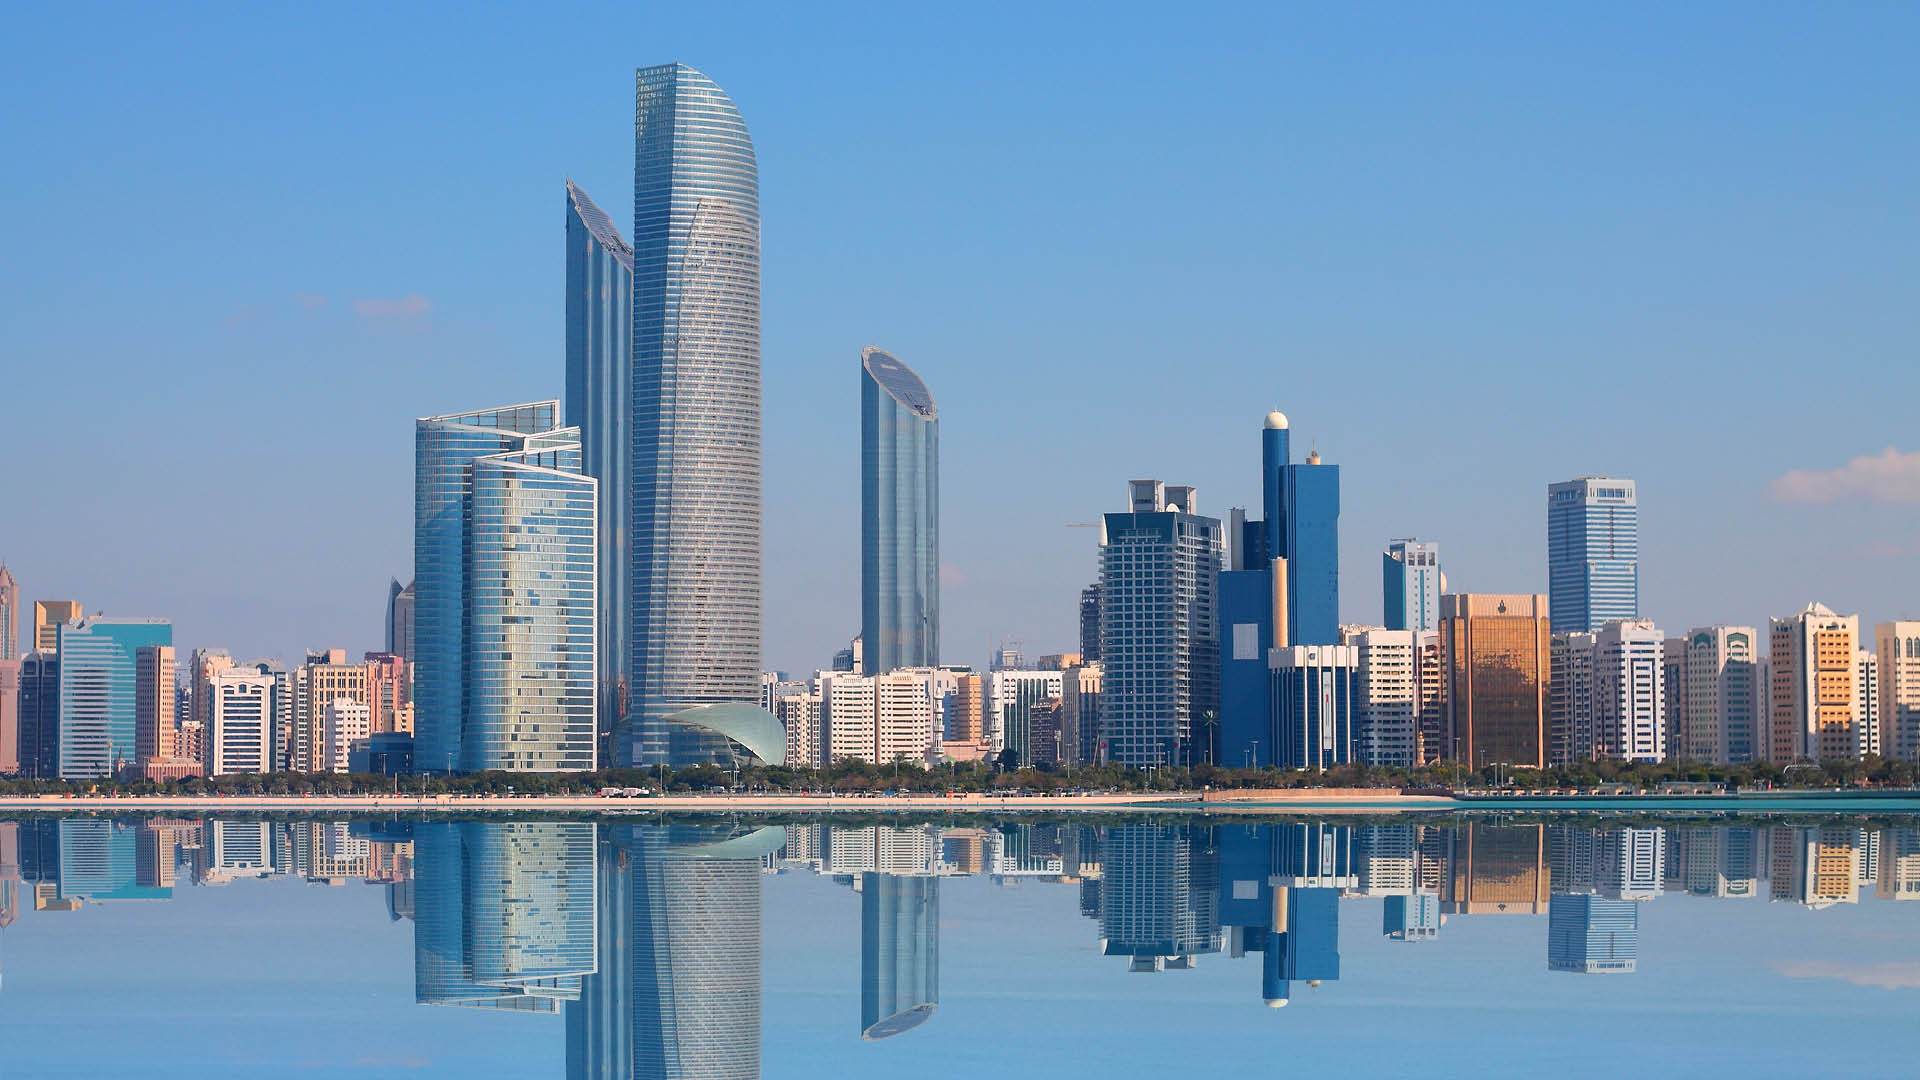 UAE skyline buildings near the sea